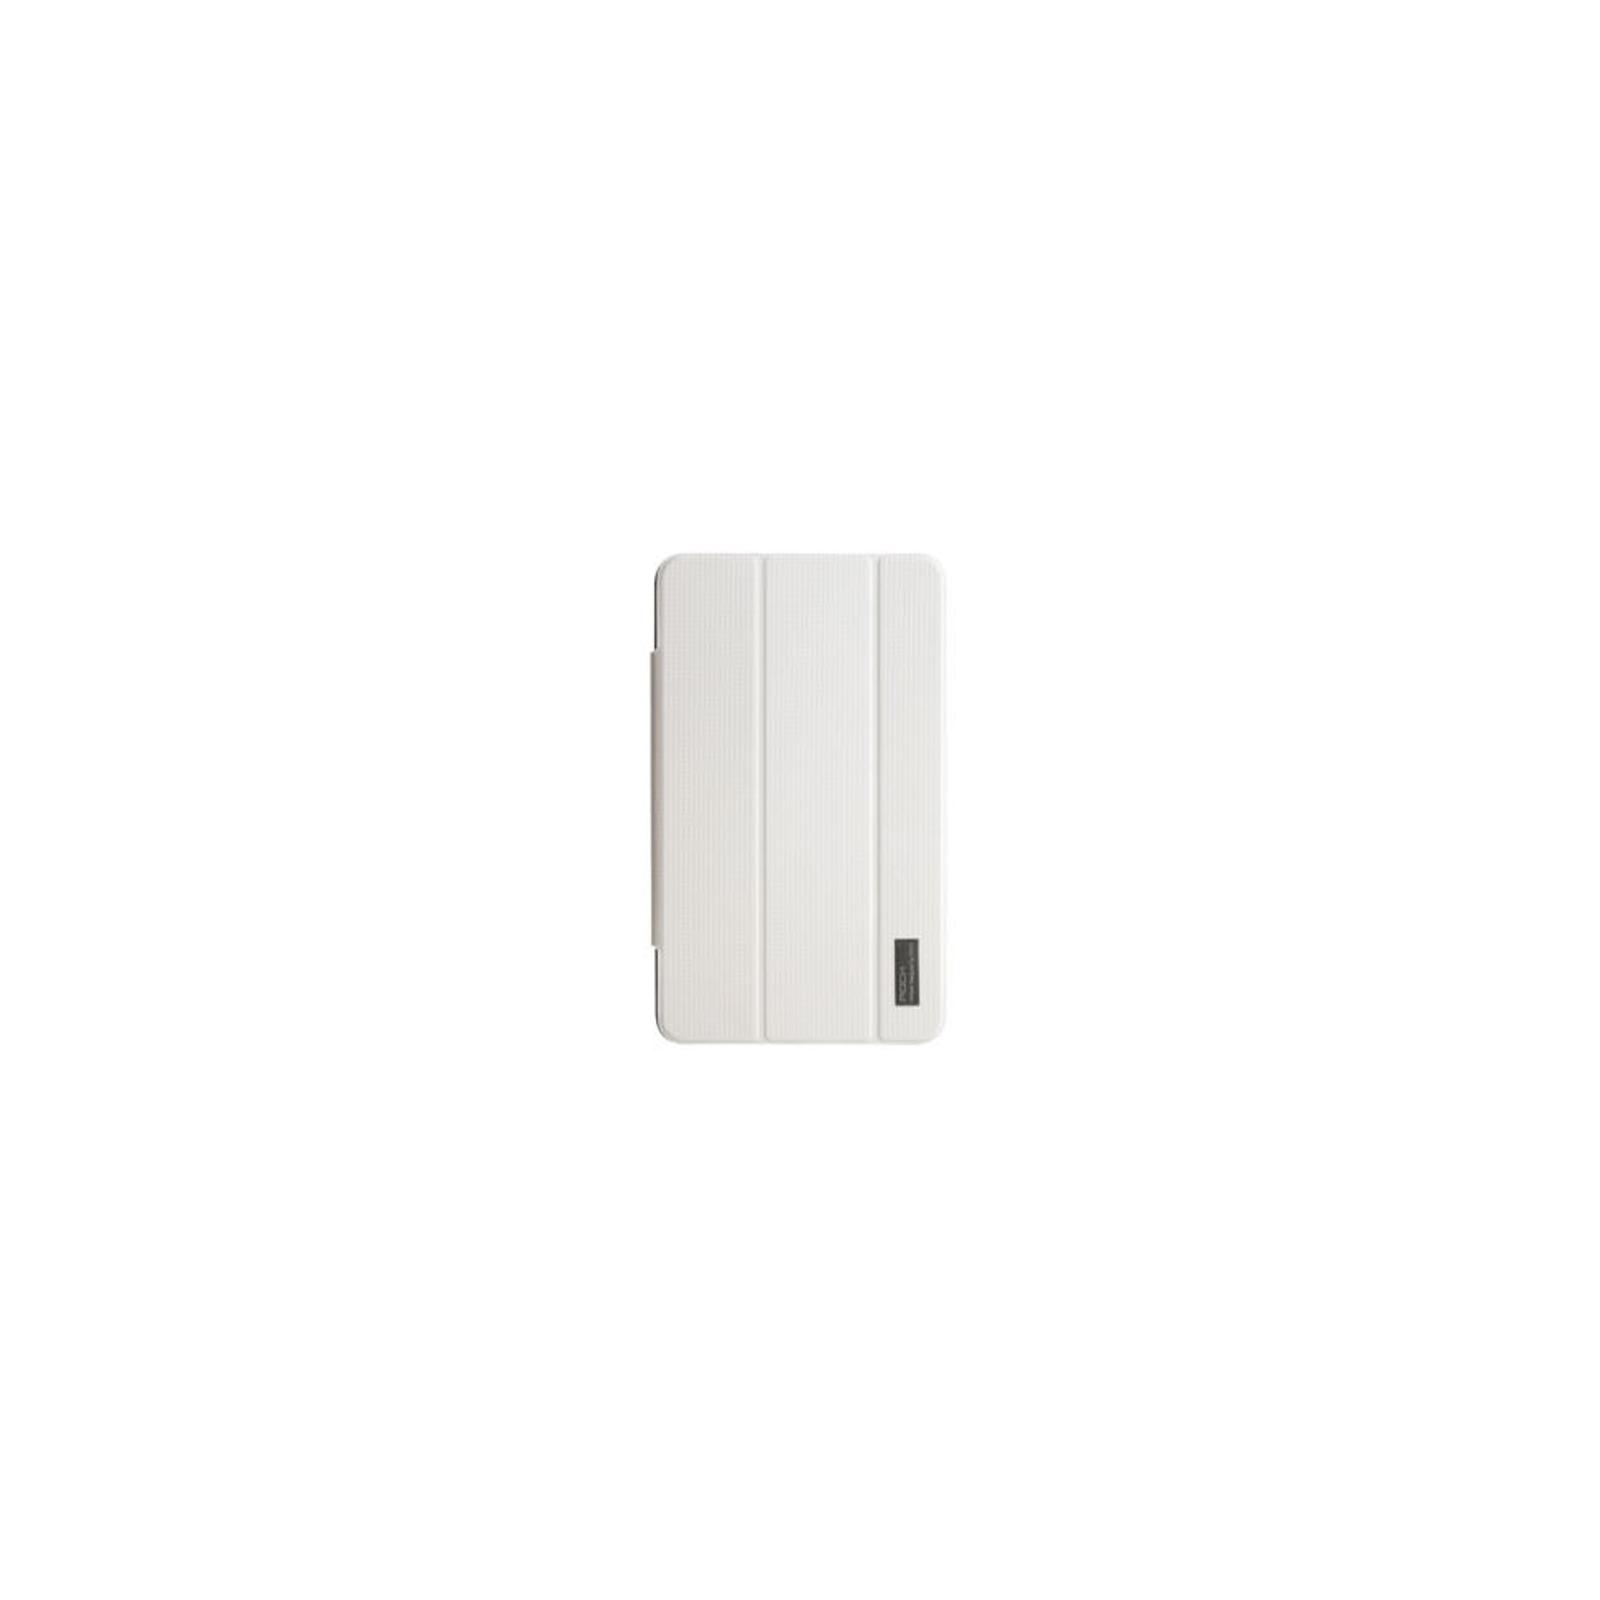 Чехол для планшета Rock Samsung Galaxy Tab 4 7.0 New elegant series white (Tab 4 7.0-65394)